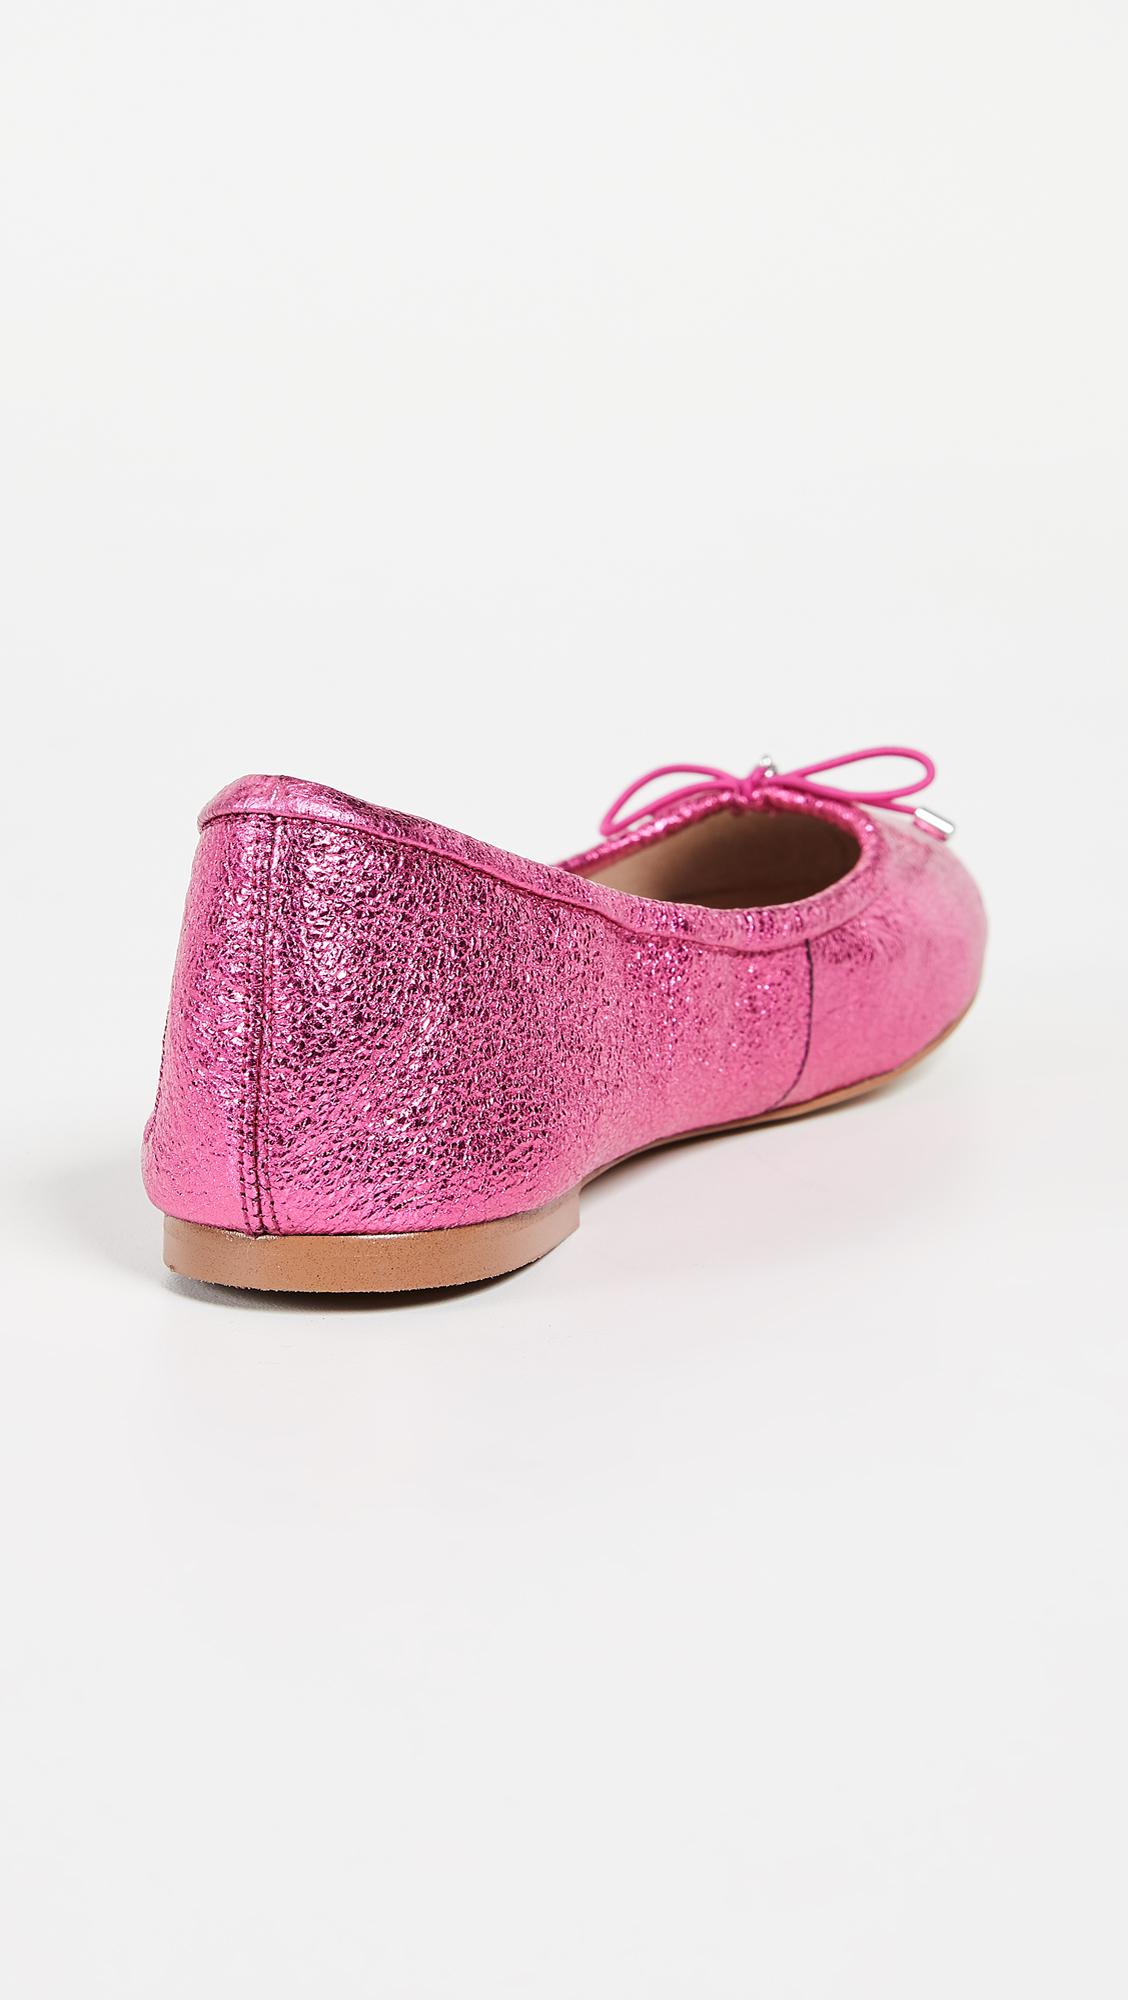 3d1fc730ddd3 Sam Edelman Felicia Ballet Flats